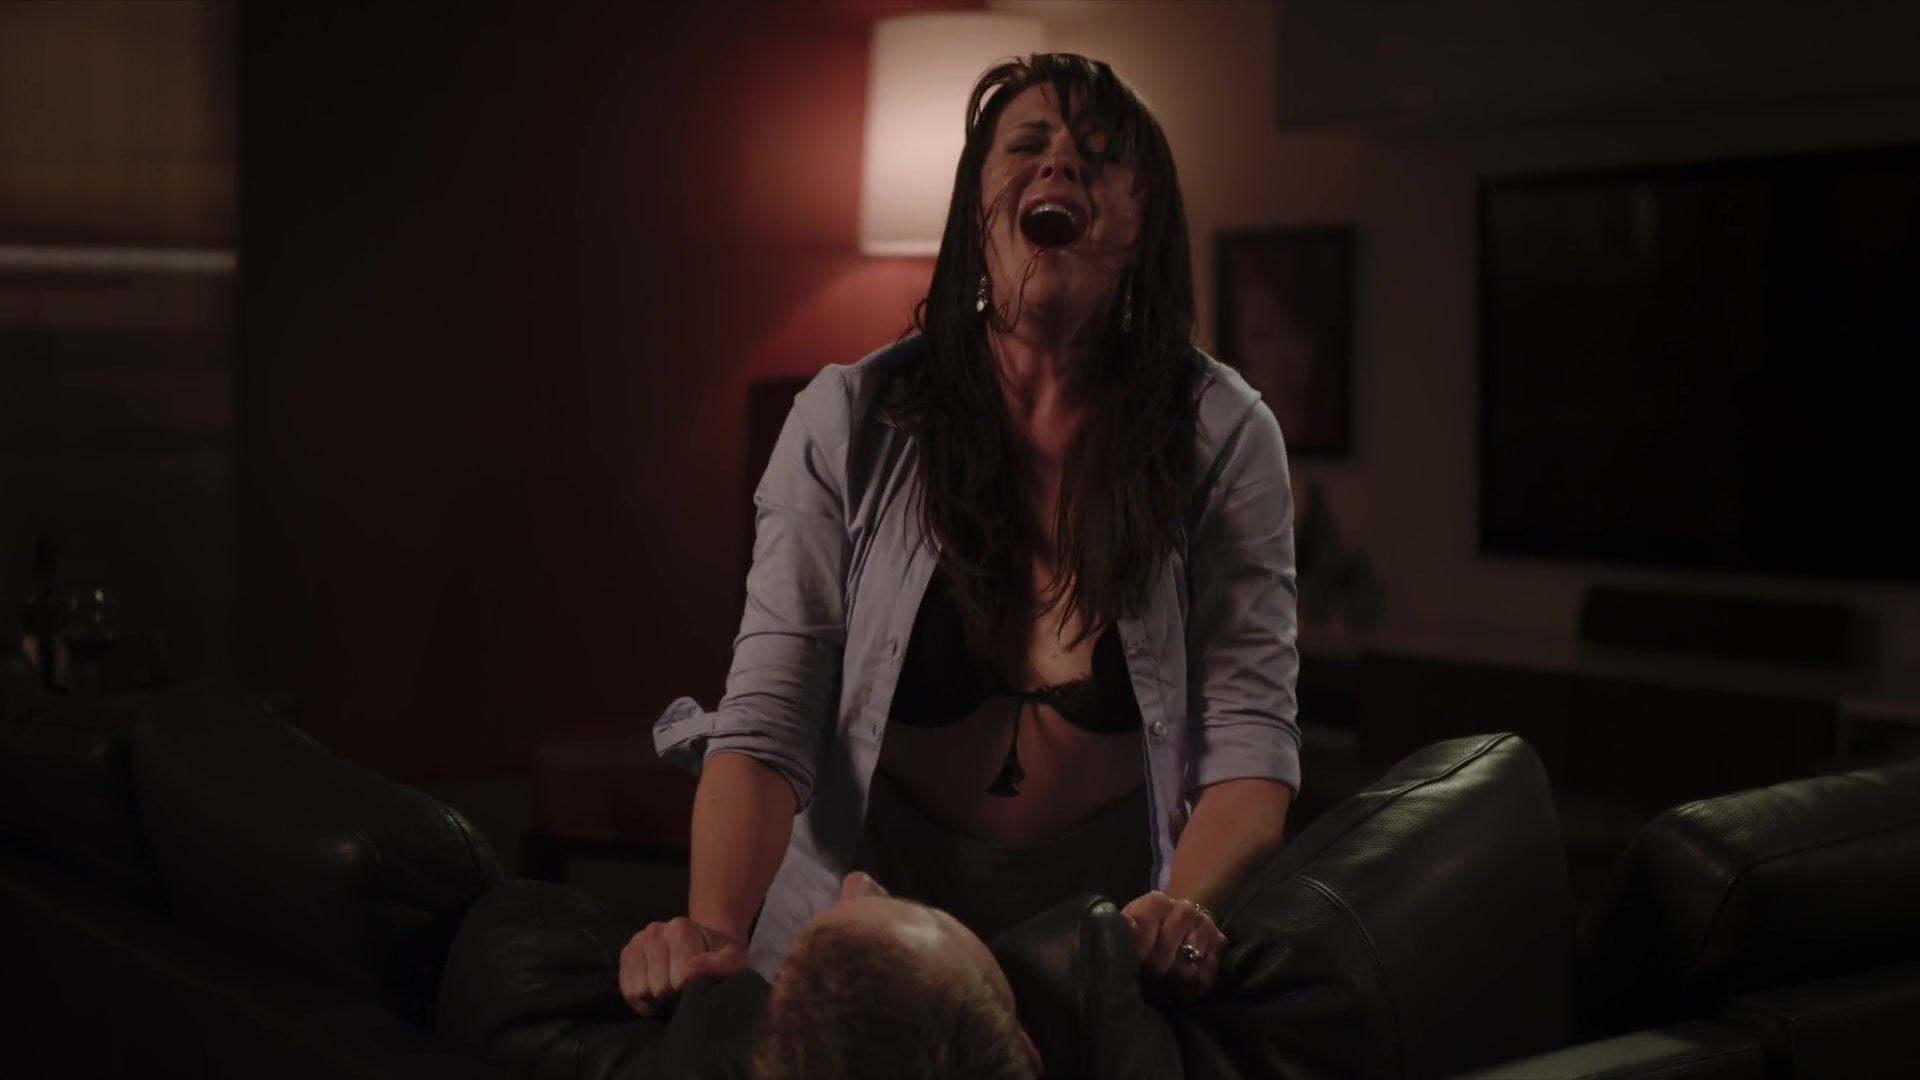 Amanda tapping sex